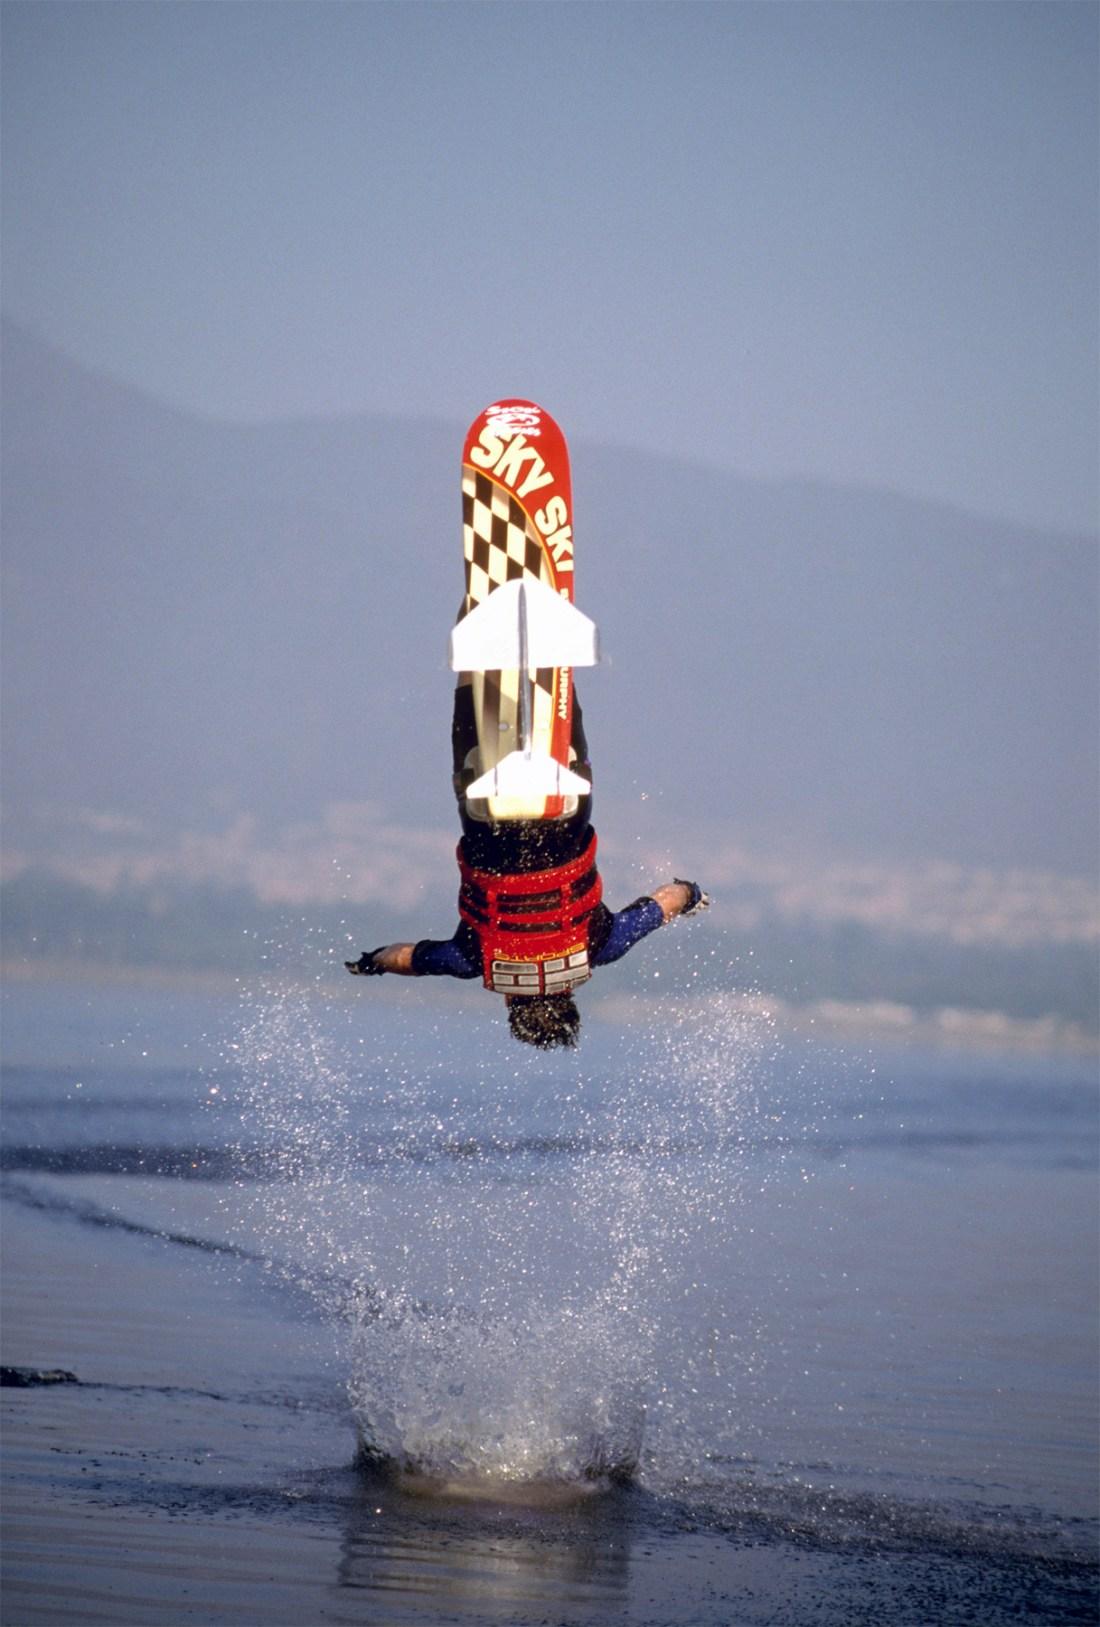 00_TonyKlarich.com_Water_Skiing_Hydrofoil_GAINERDISMOUNT_Creative_Commons_Free_3MR